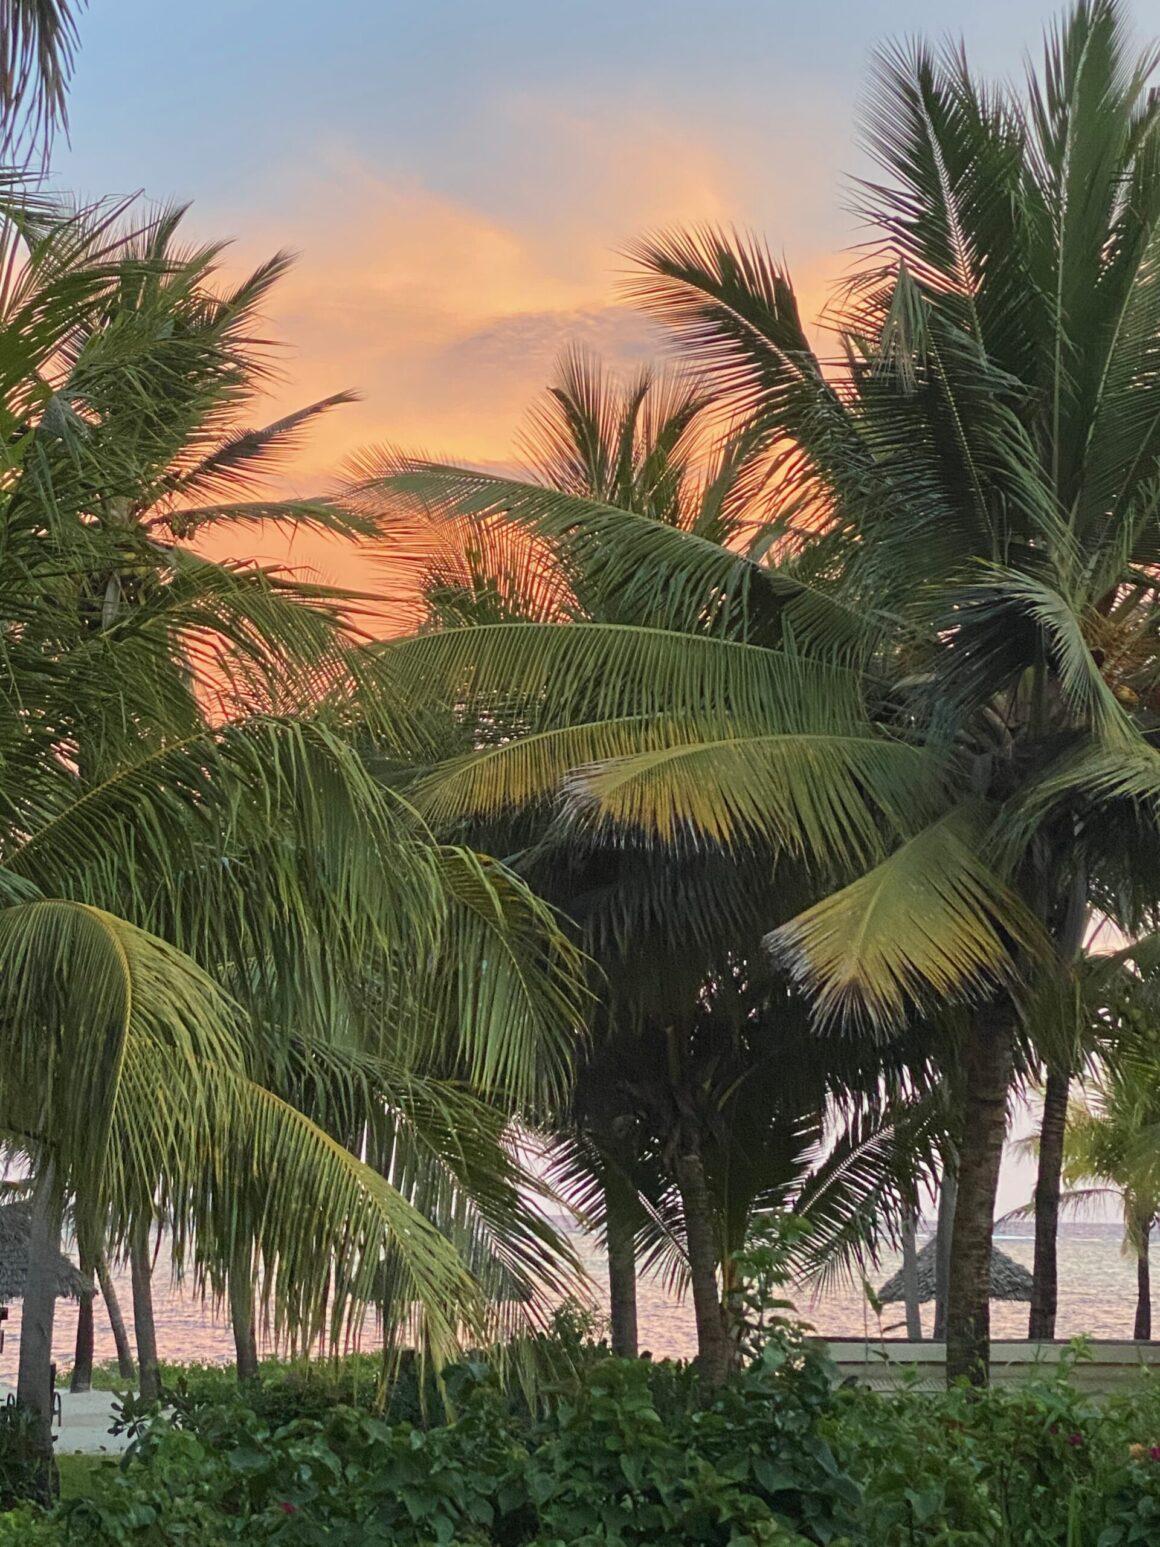 Baraza Resort sun setting